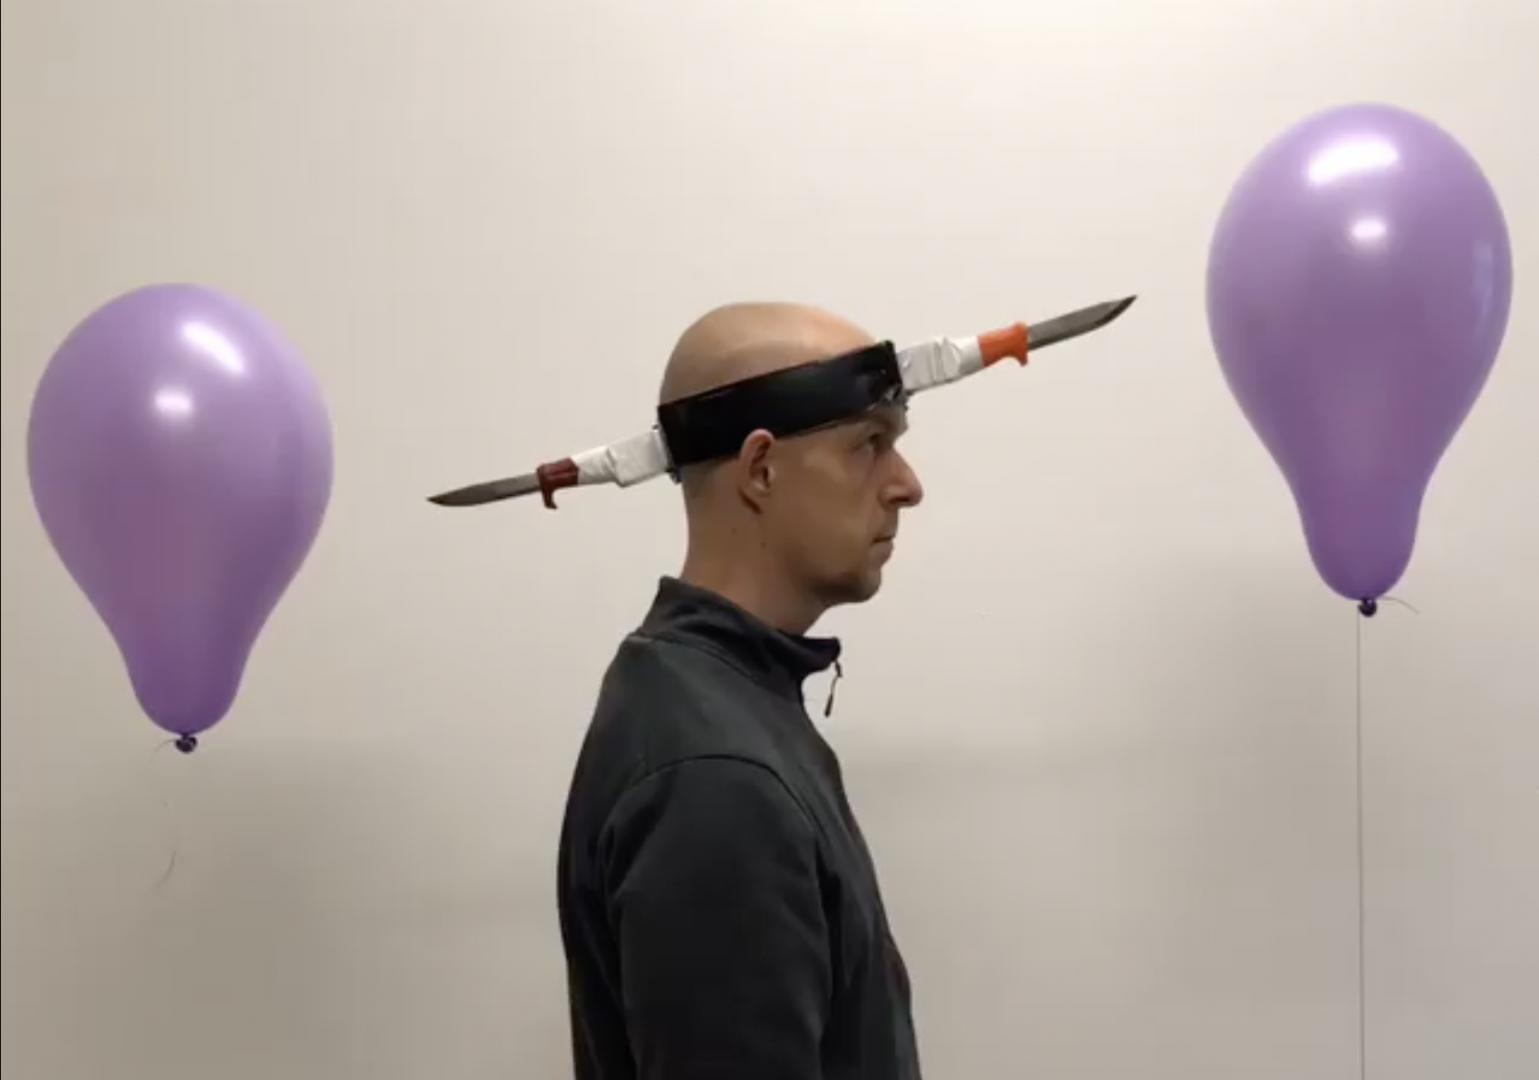 L'arte performativa di Jan Hakon Erichsen aka balloon destroyer